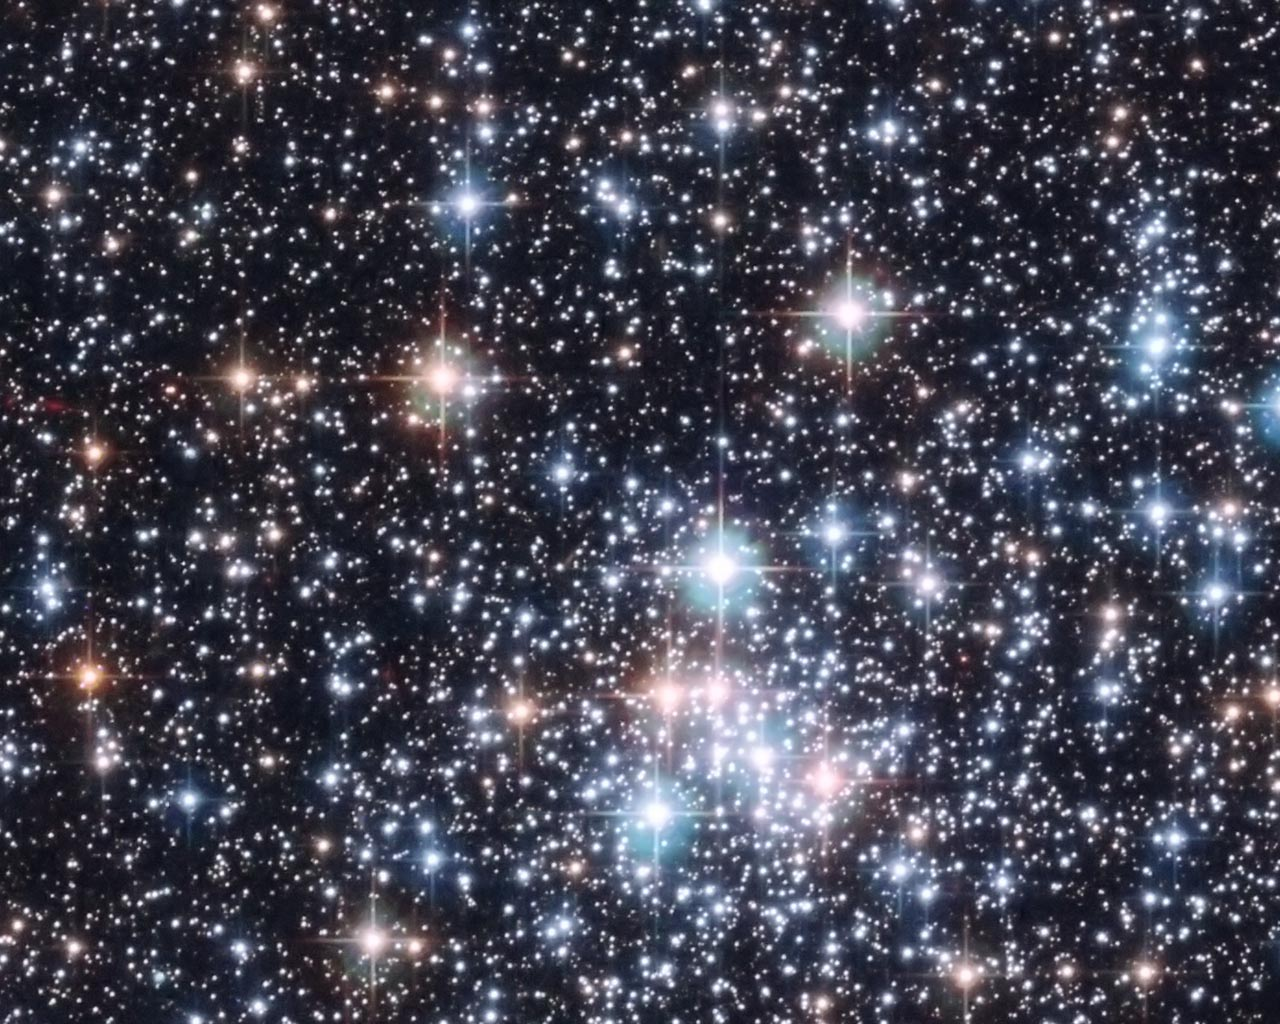 Night Sky Stars hd Wallpaper Starry Night Sky Space Stars 1280x1024